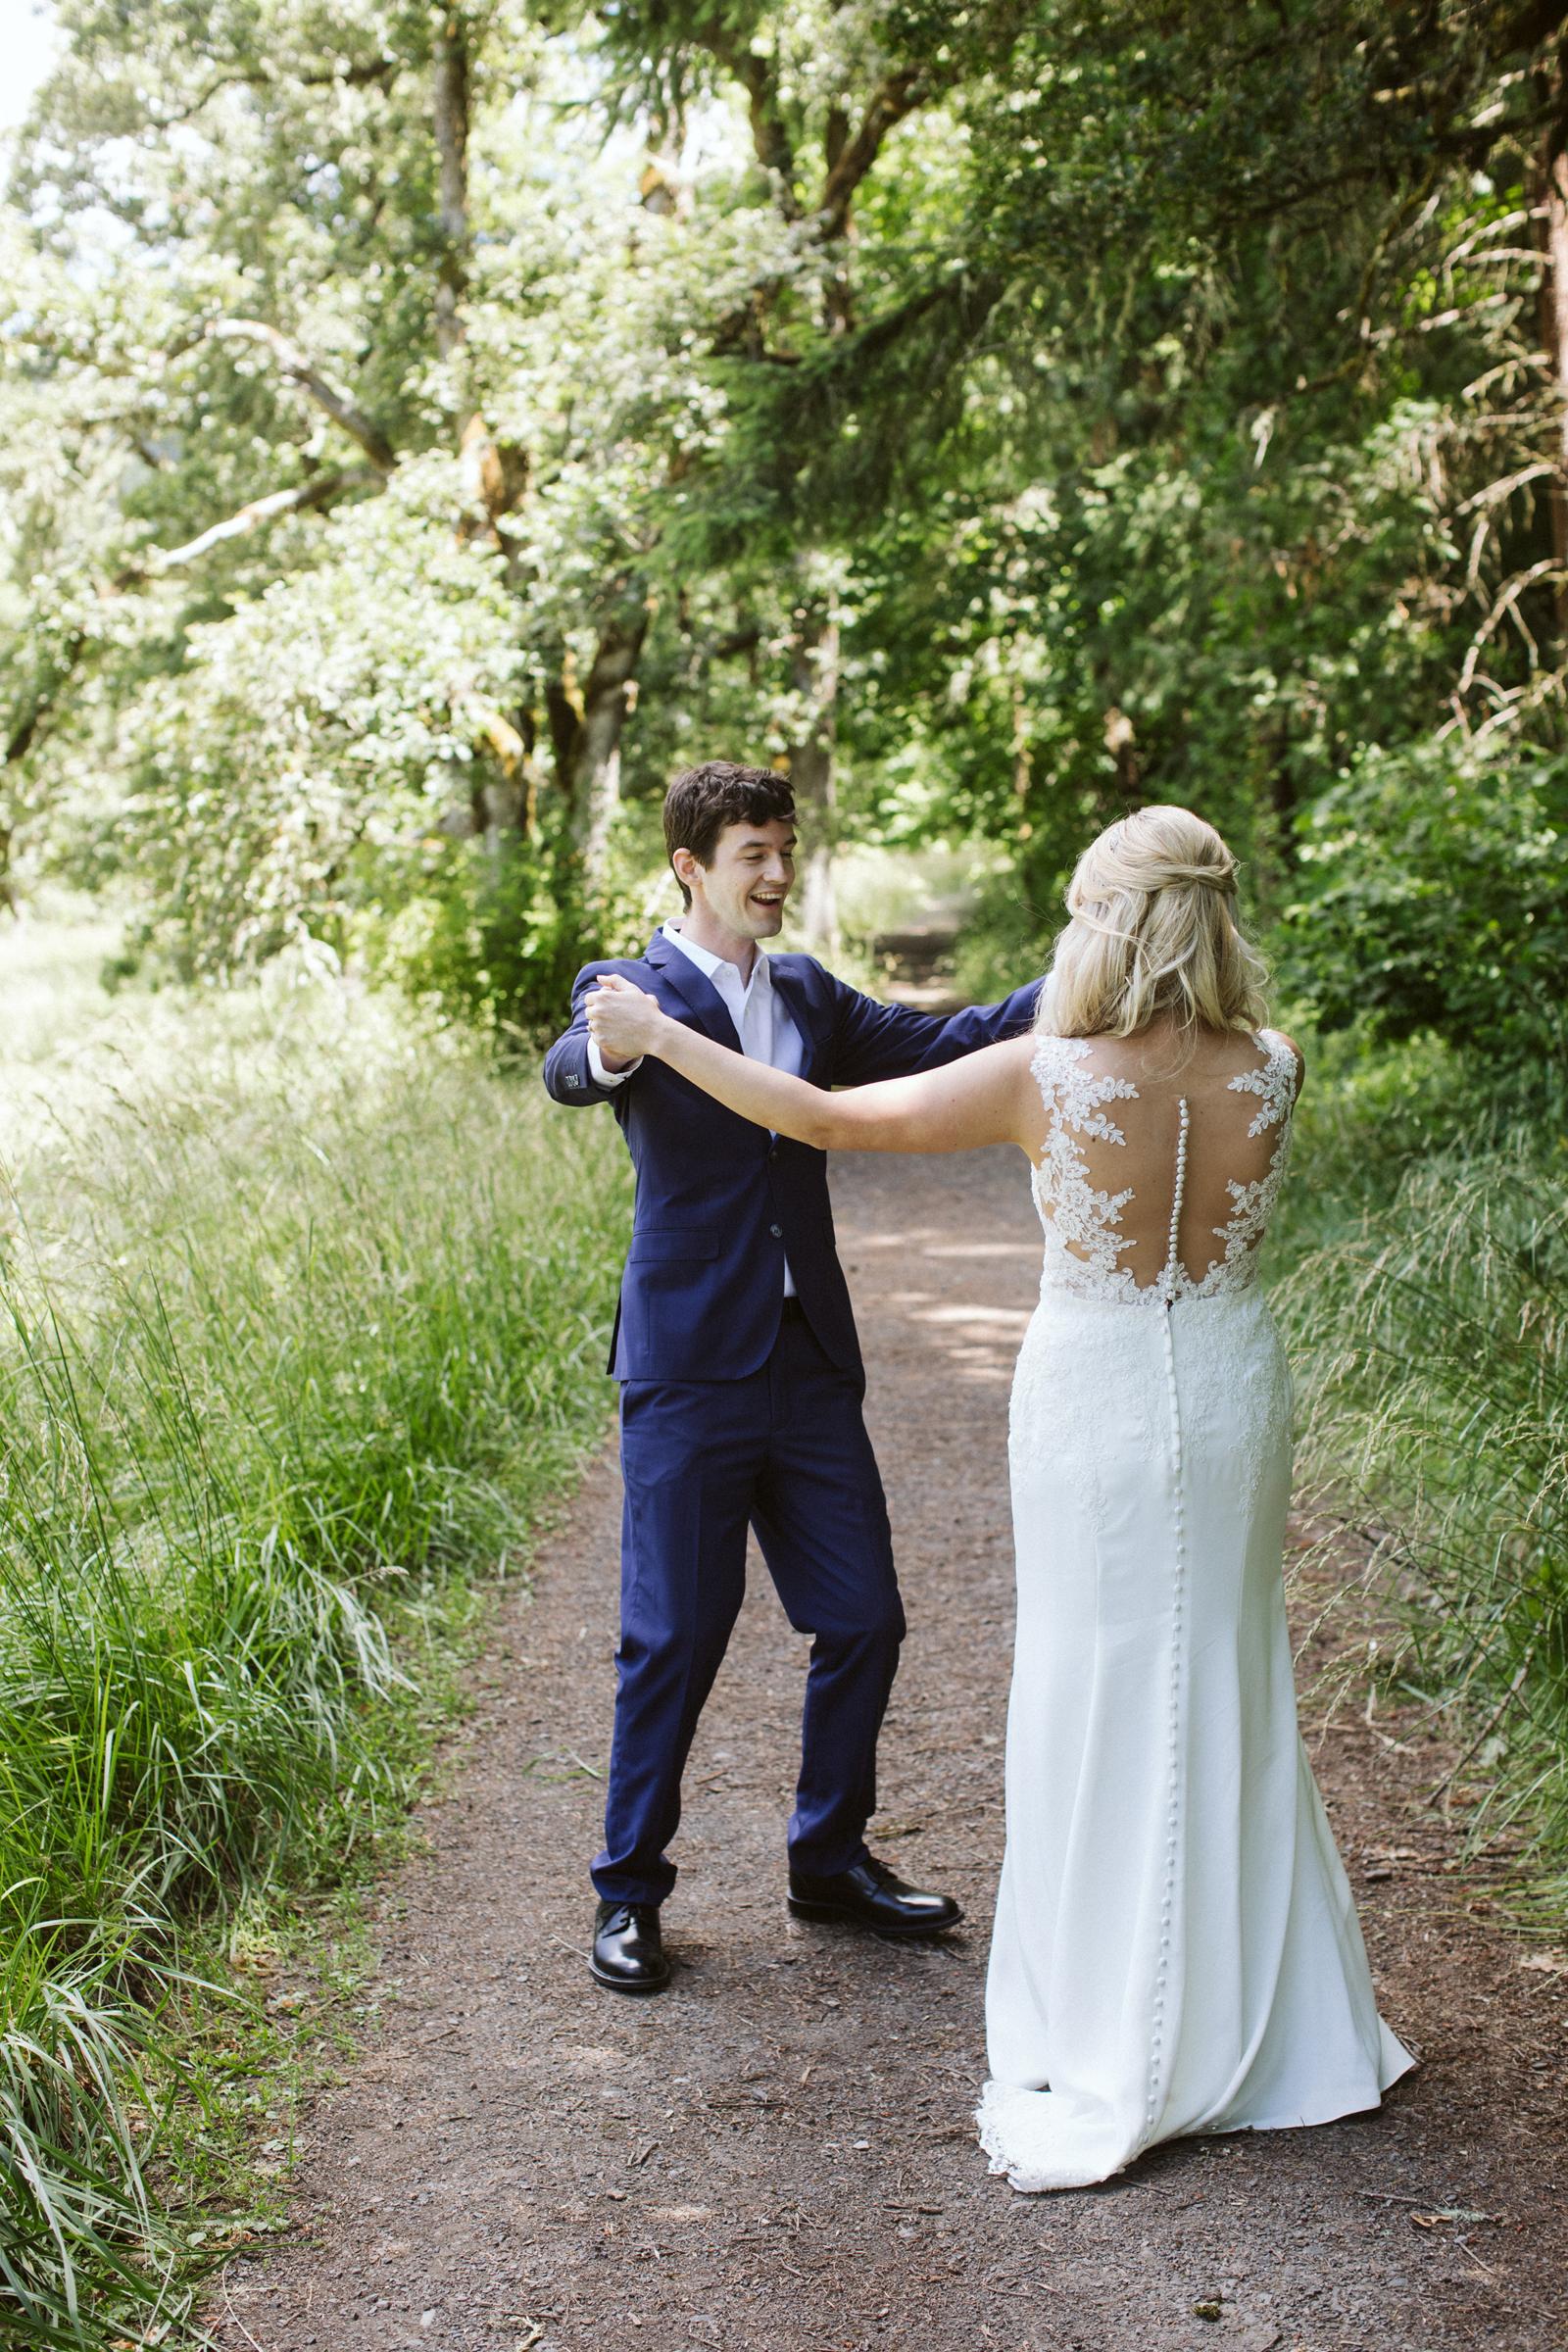 005-daronjackson-rachel-michael-wedding-mtpisgah.jpg